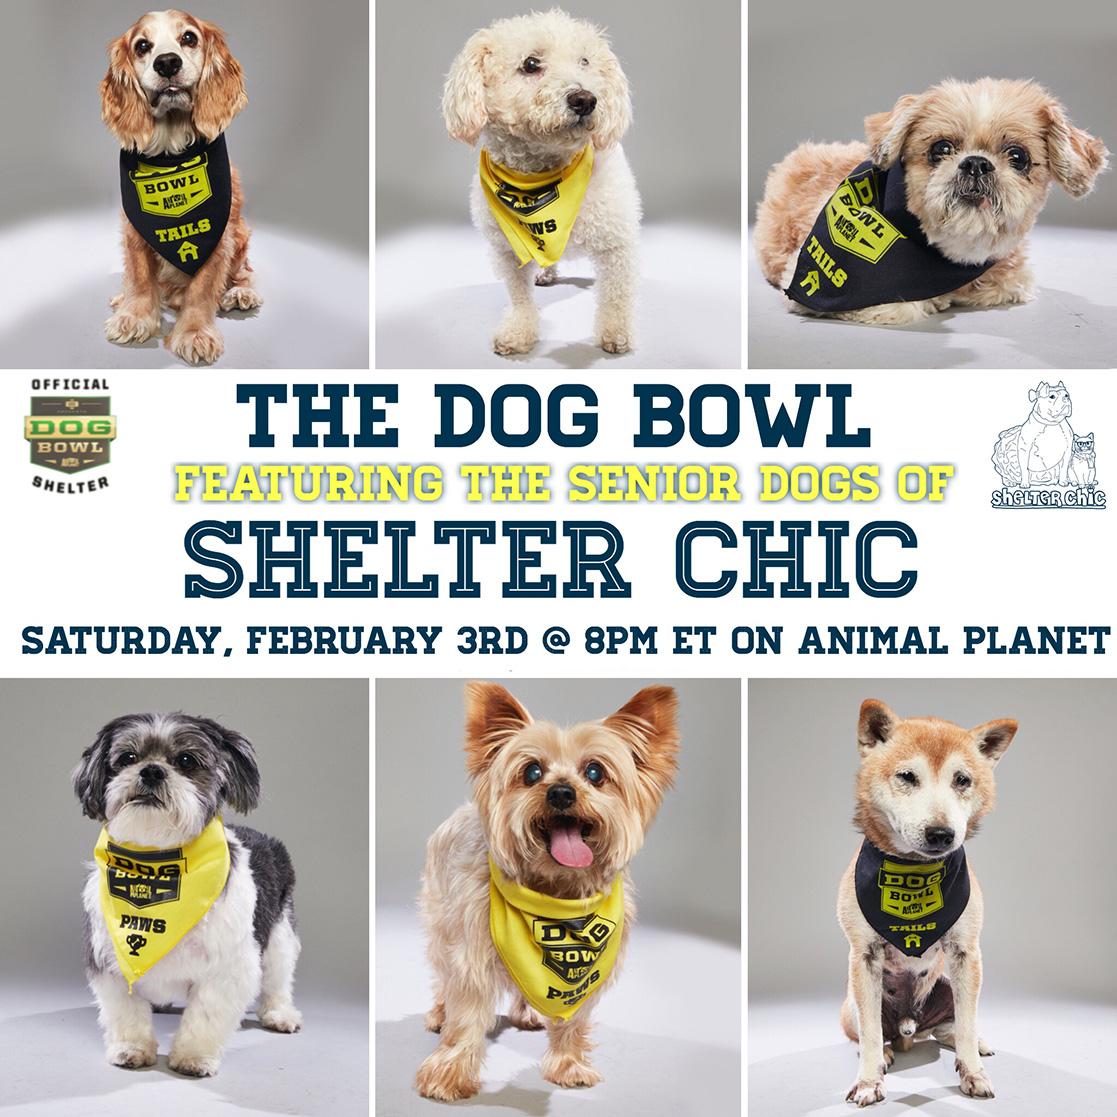 The Dog Bowl